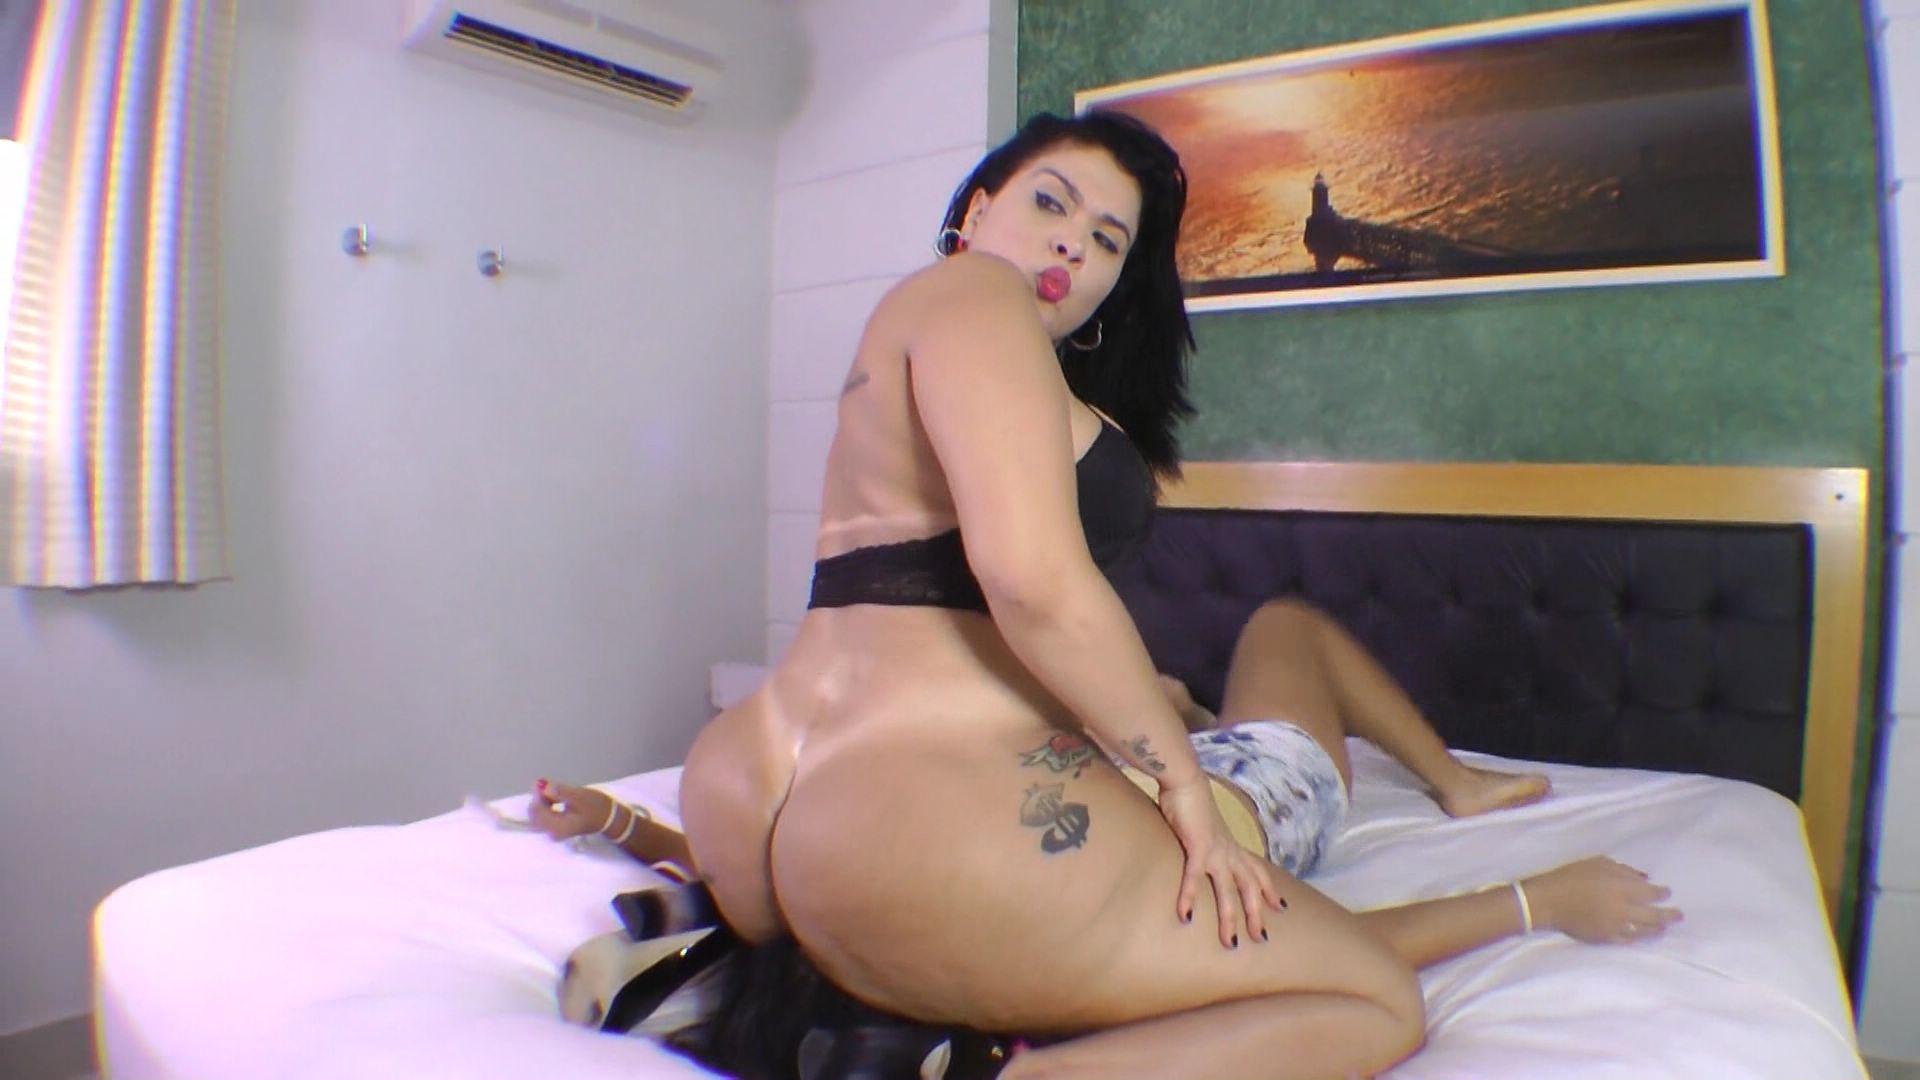 facesitting big butt destroy face: soraya carioca vs tied slave girl